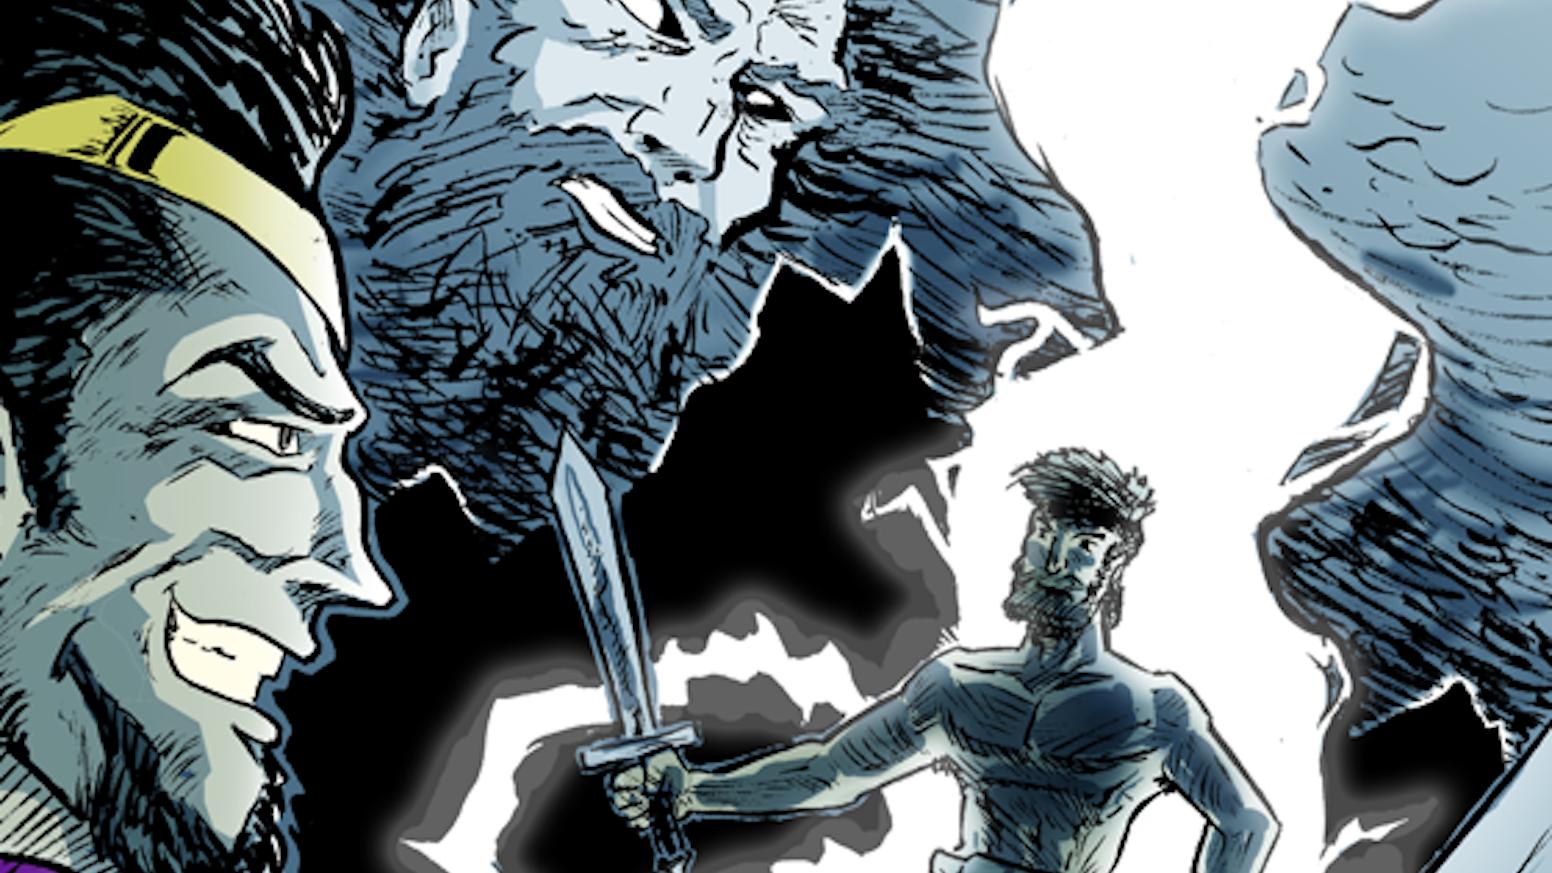 Judges: A Gritty Comic Retelling of Biblical Superhero Tales